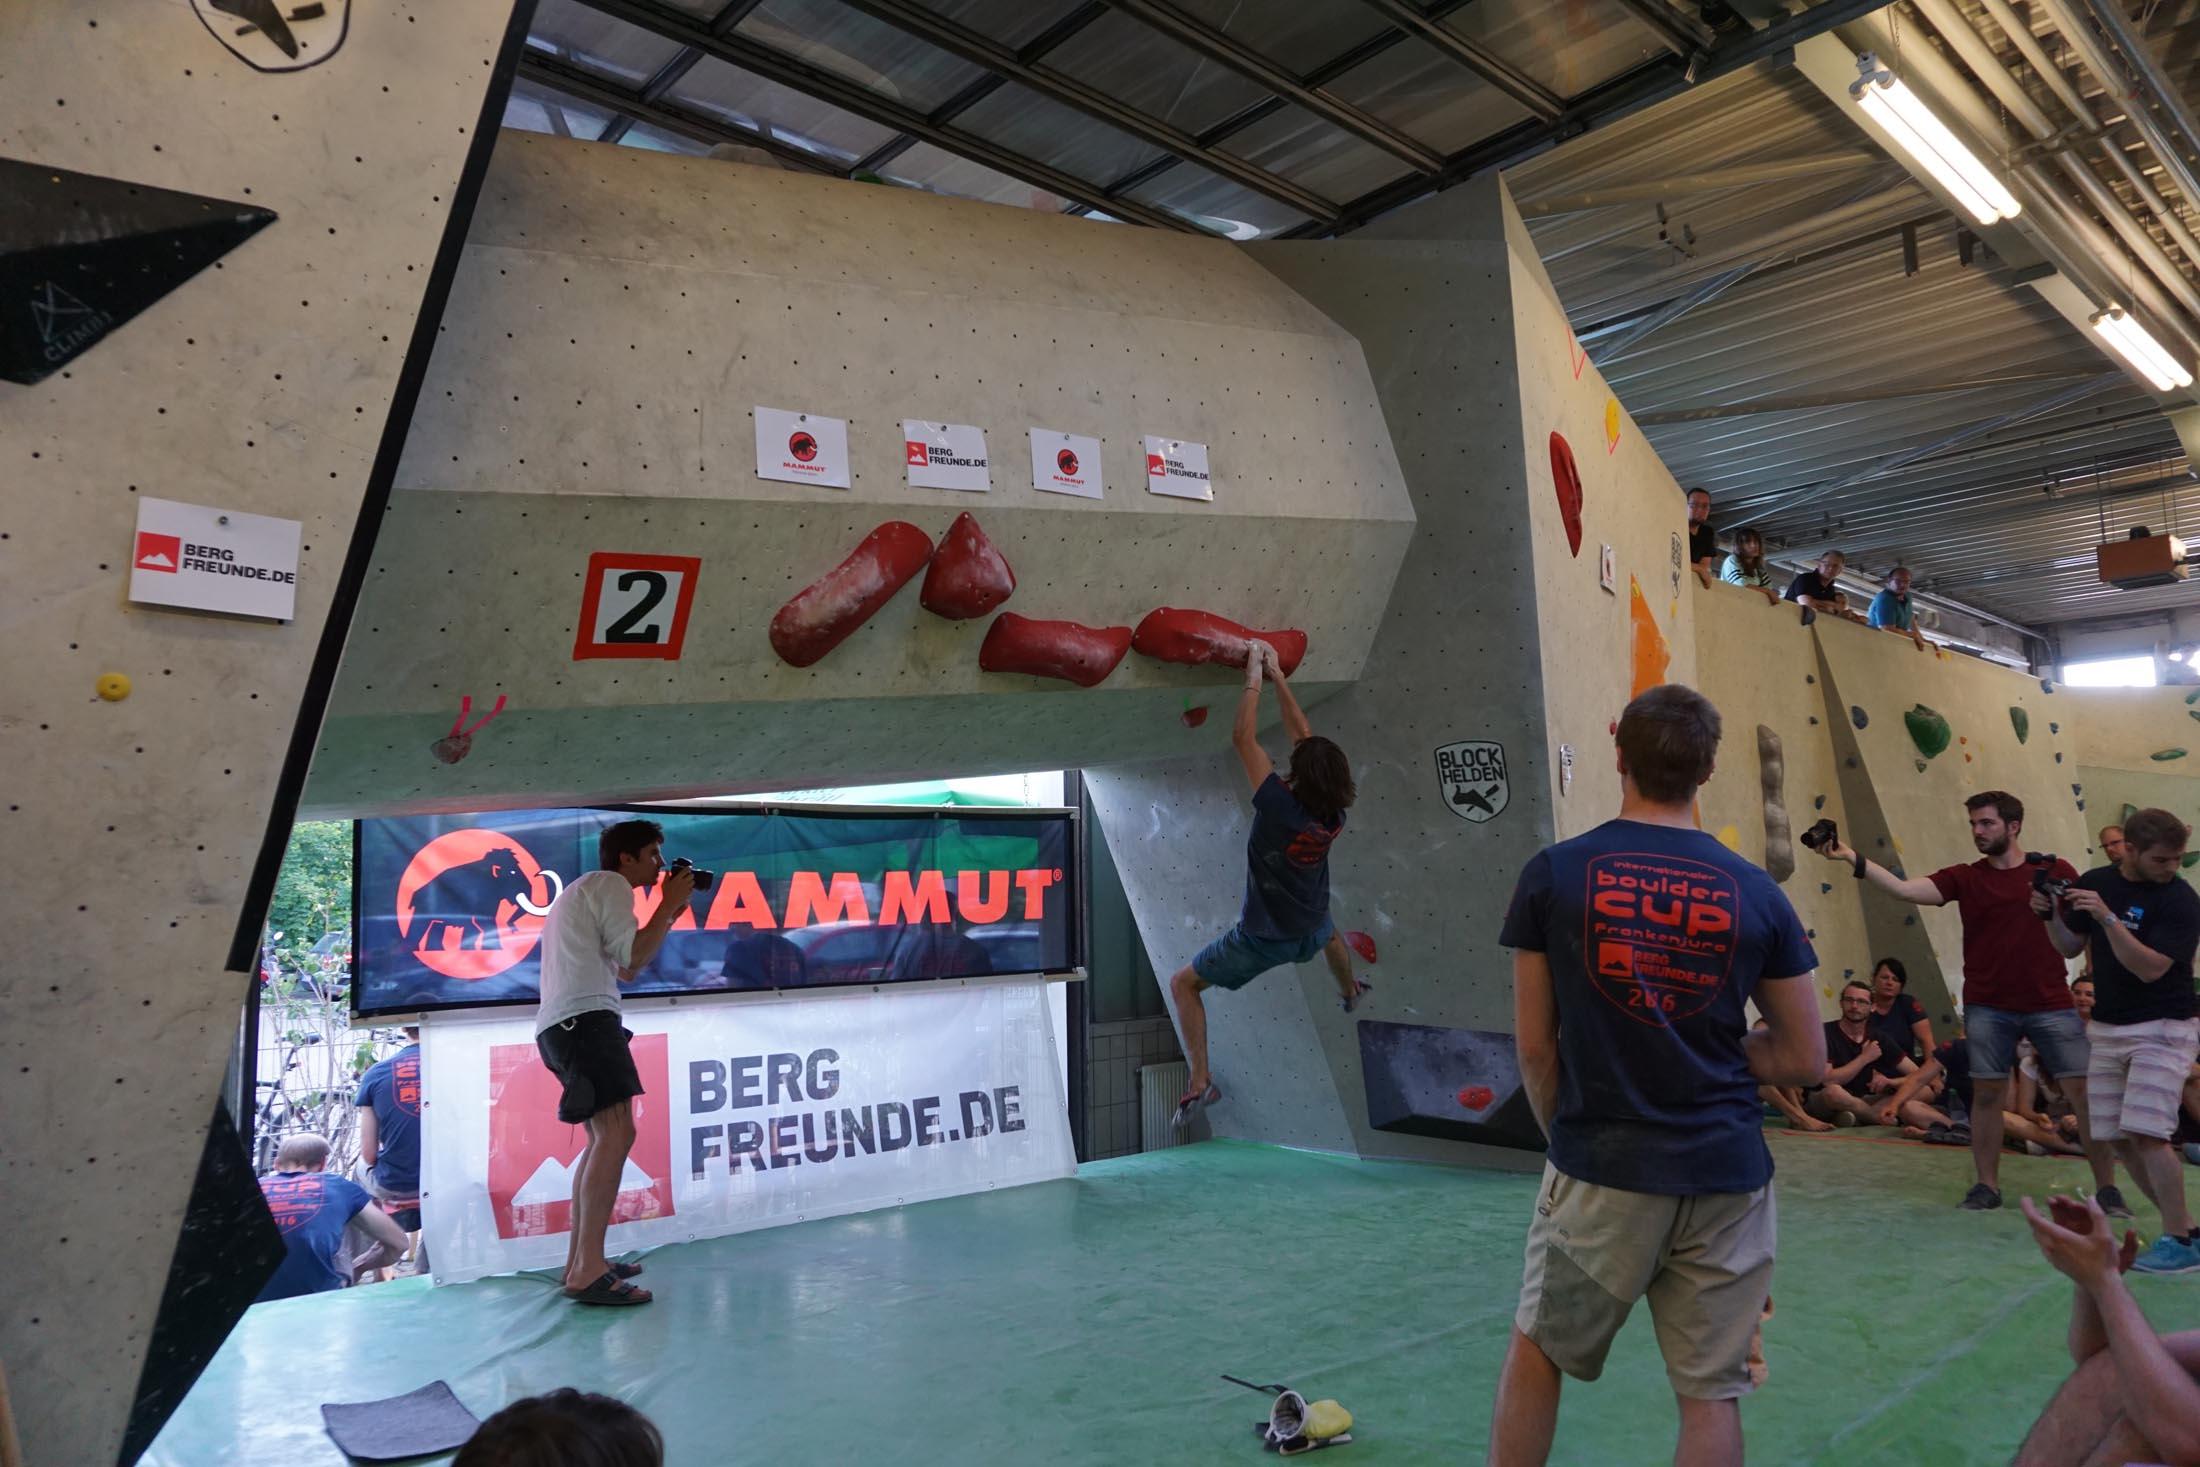 Finale, internationaler bouldercup Frankenjura 2016, BLOCKHELDEN Erlangen, Mammut, Bergfreunde.de, Boulderwettkampf07092016581